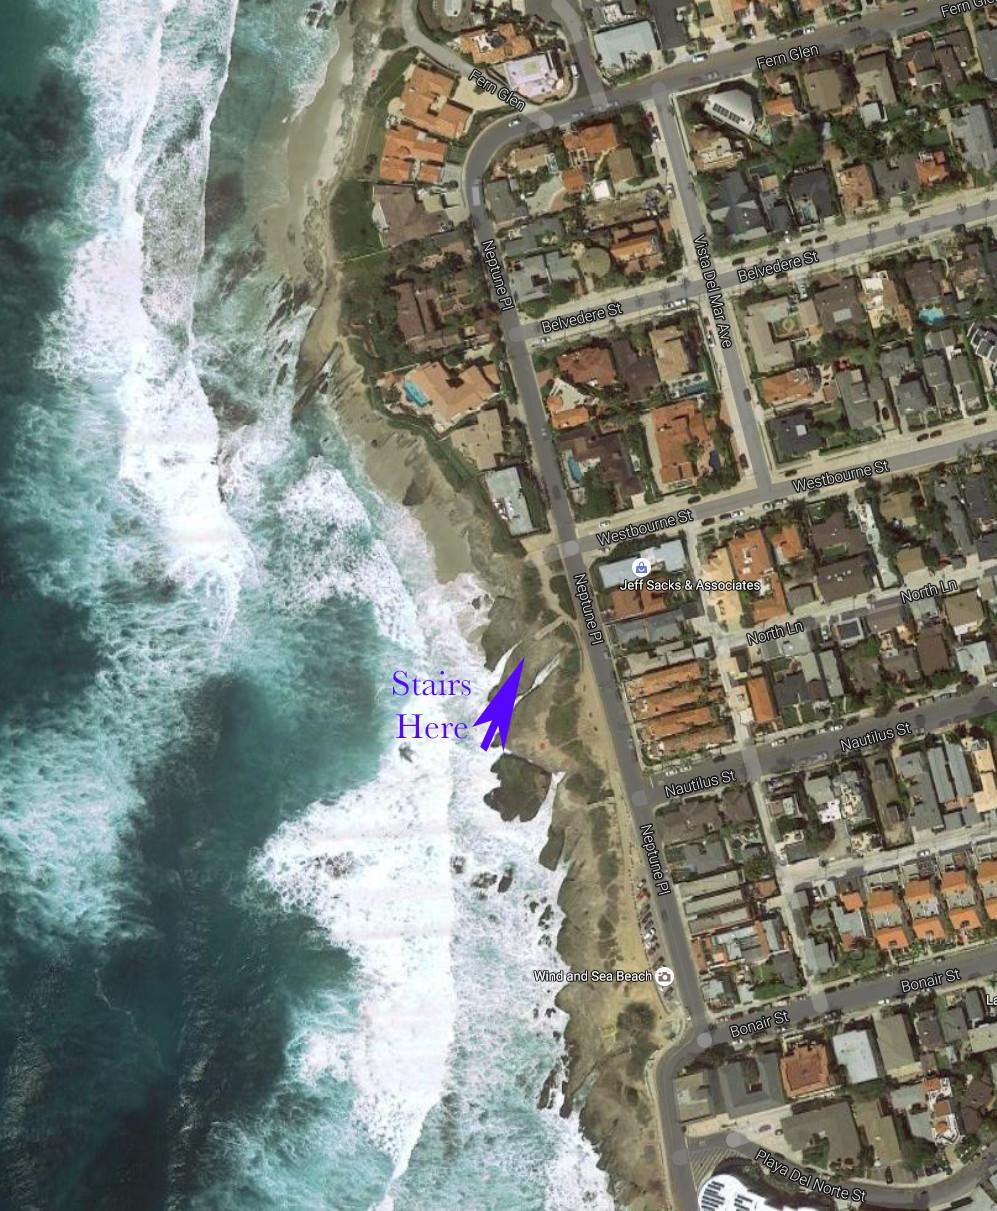 Windansea coastline area just south of downtown La Jolla, California.